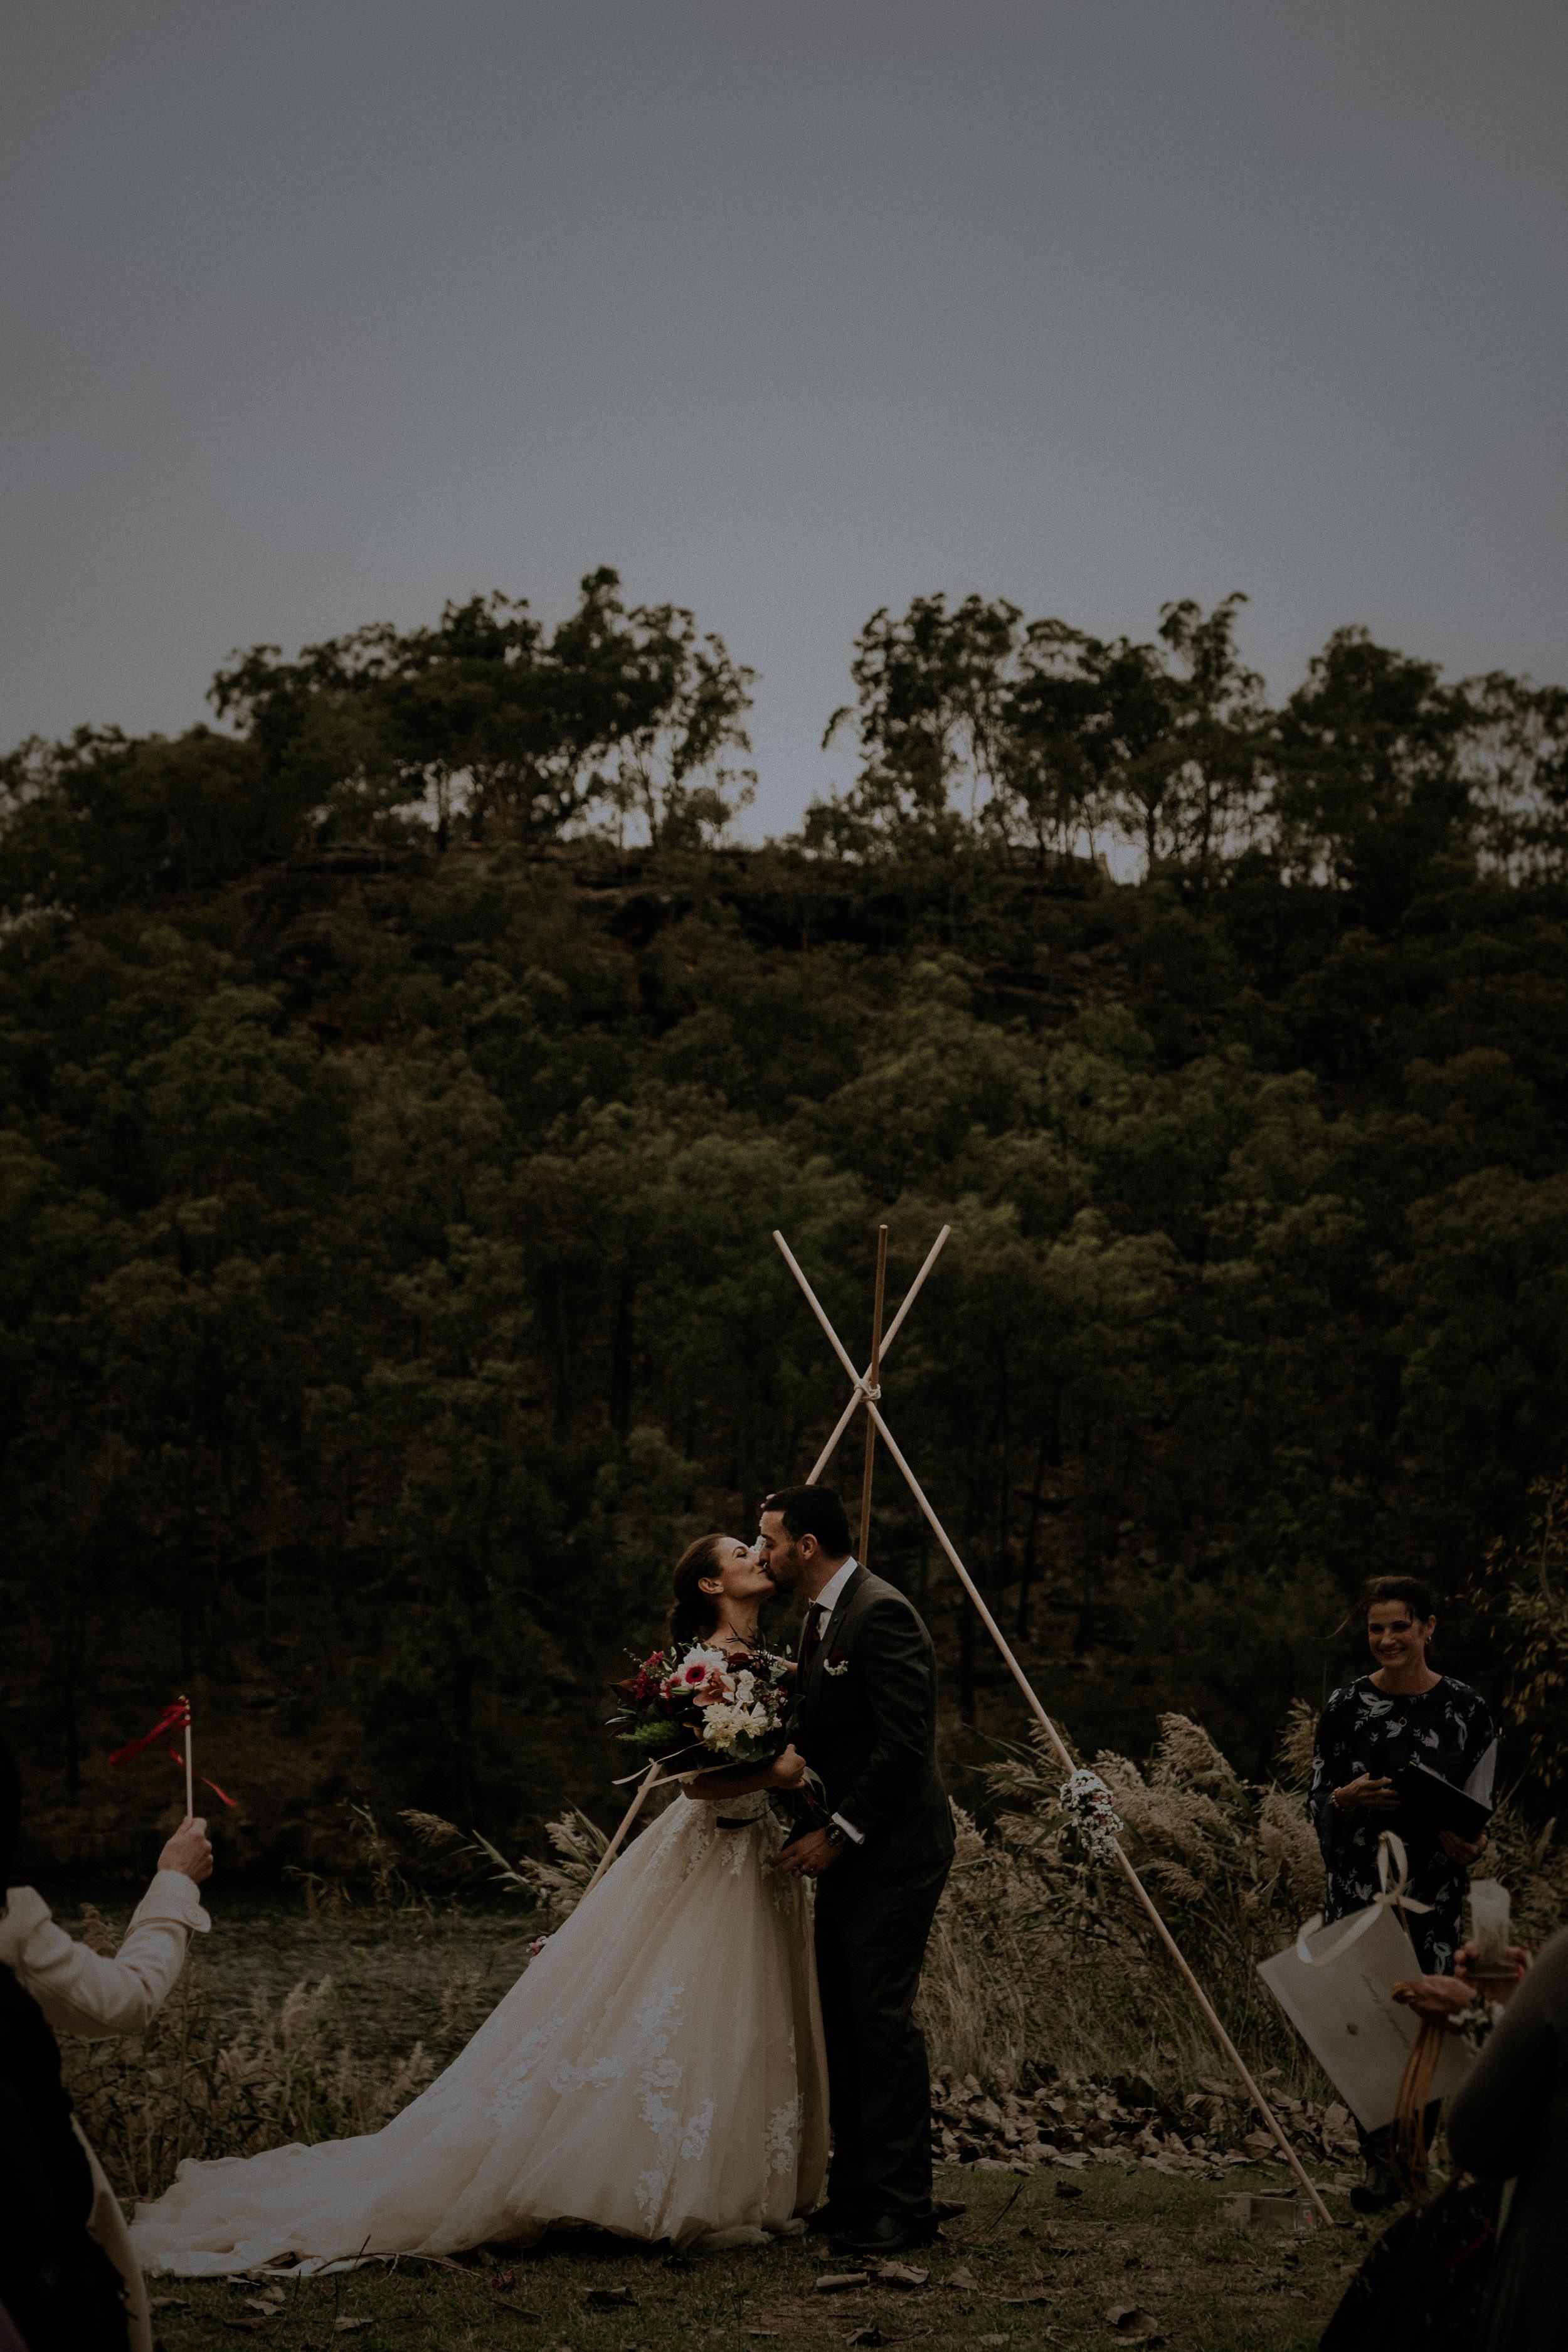 g_c wedding - kings _ thieves elopement wedding photography - blog 50.jpg